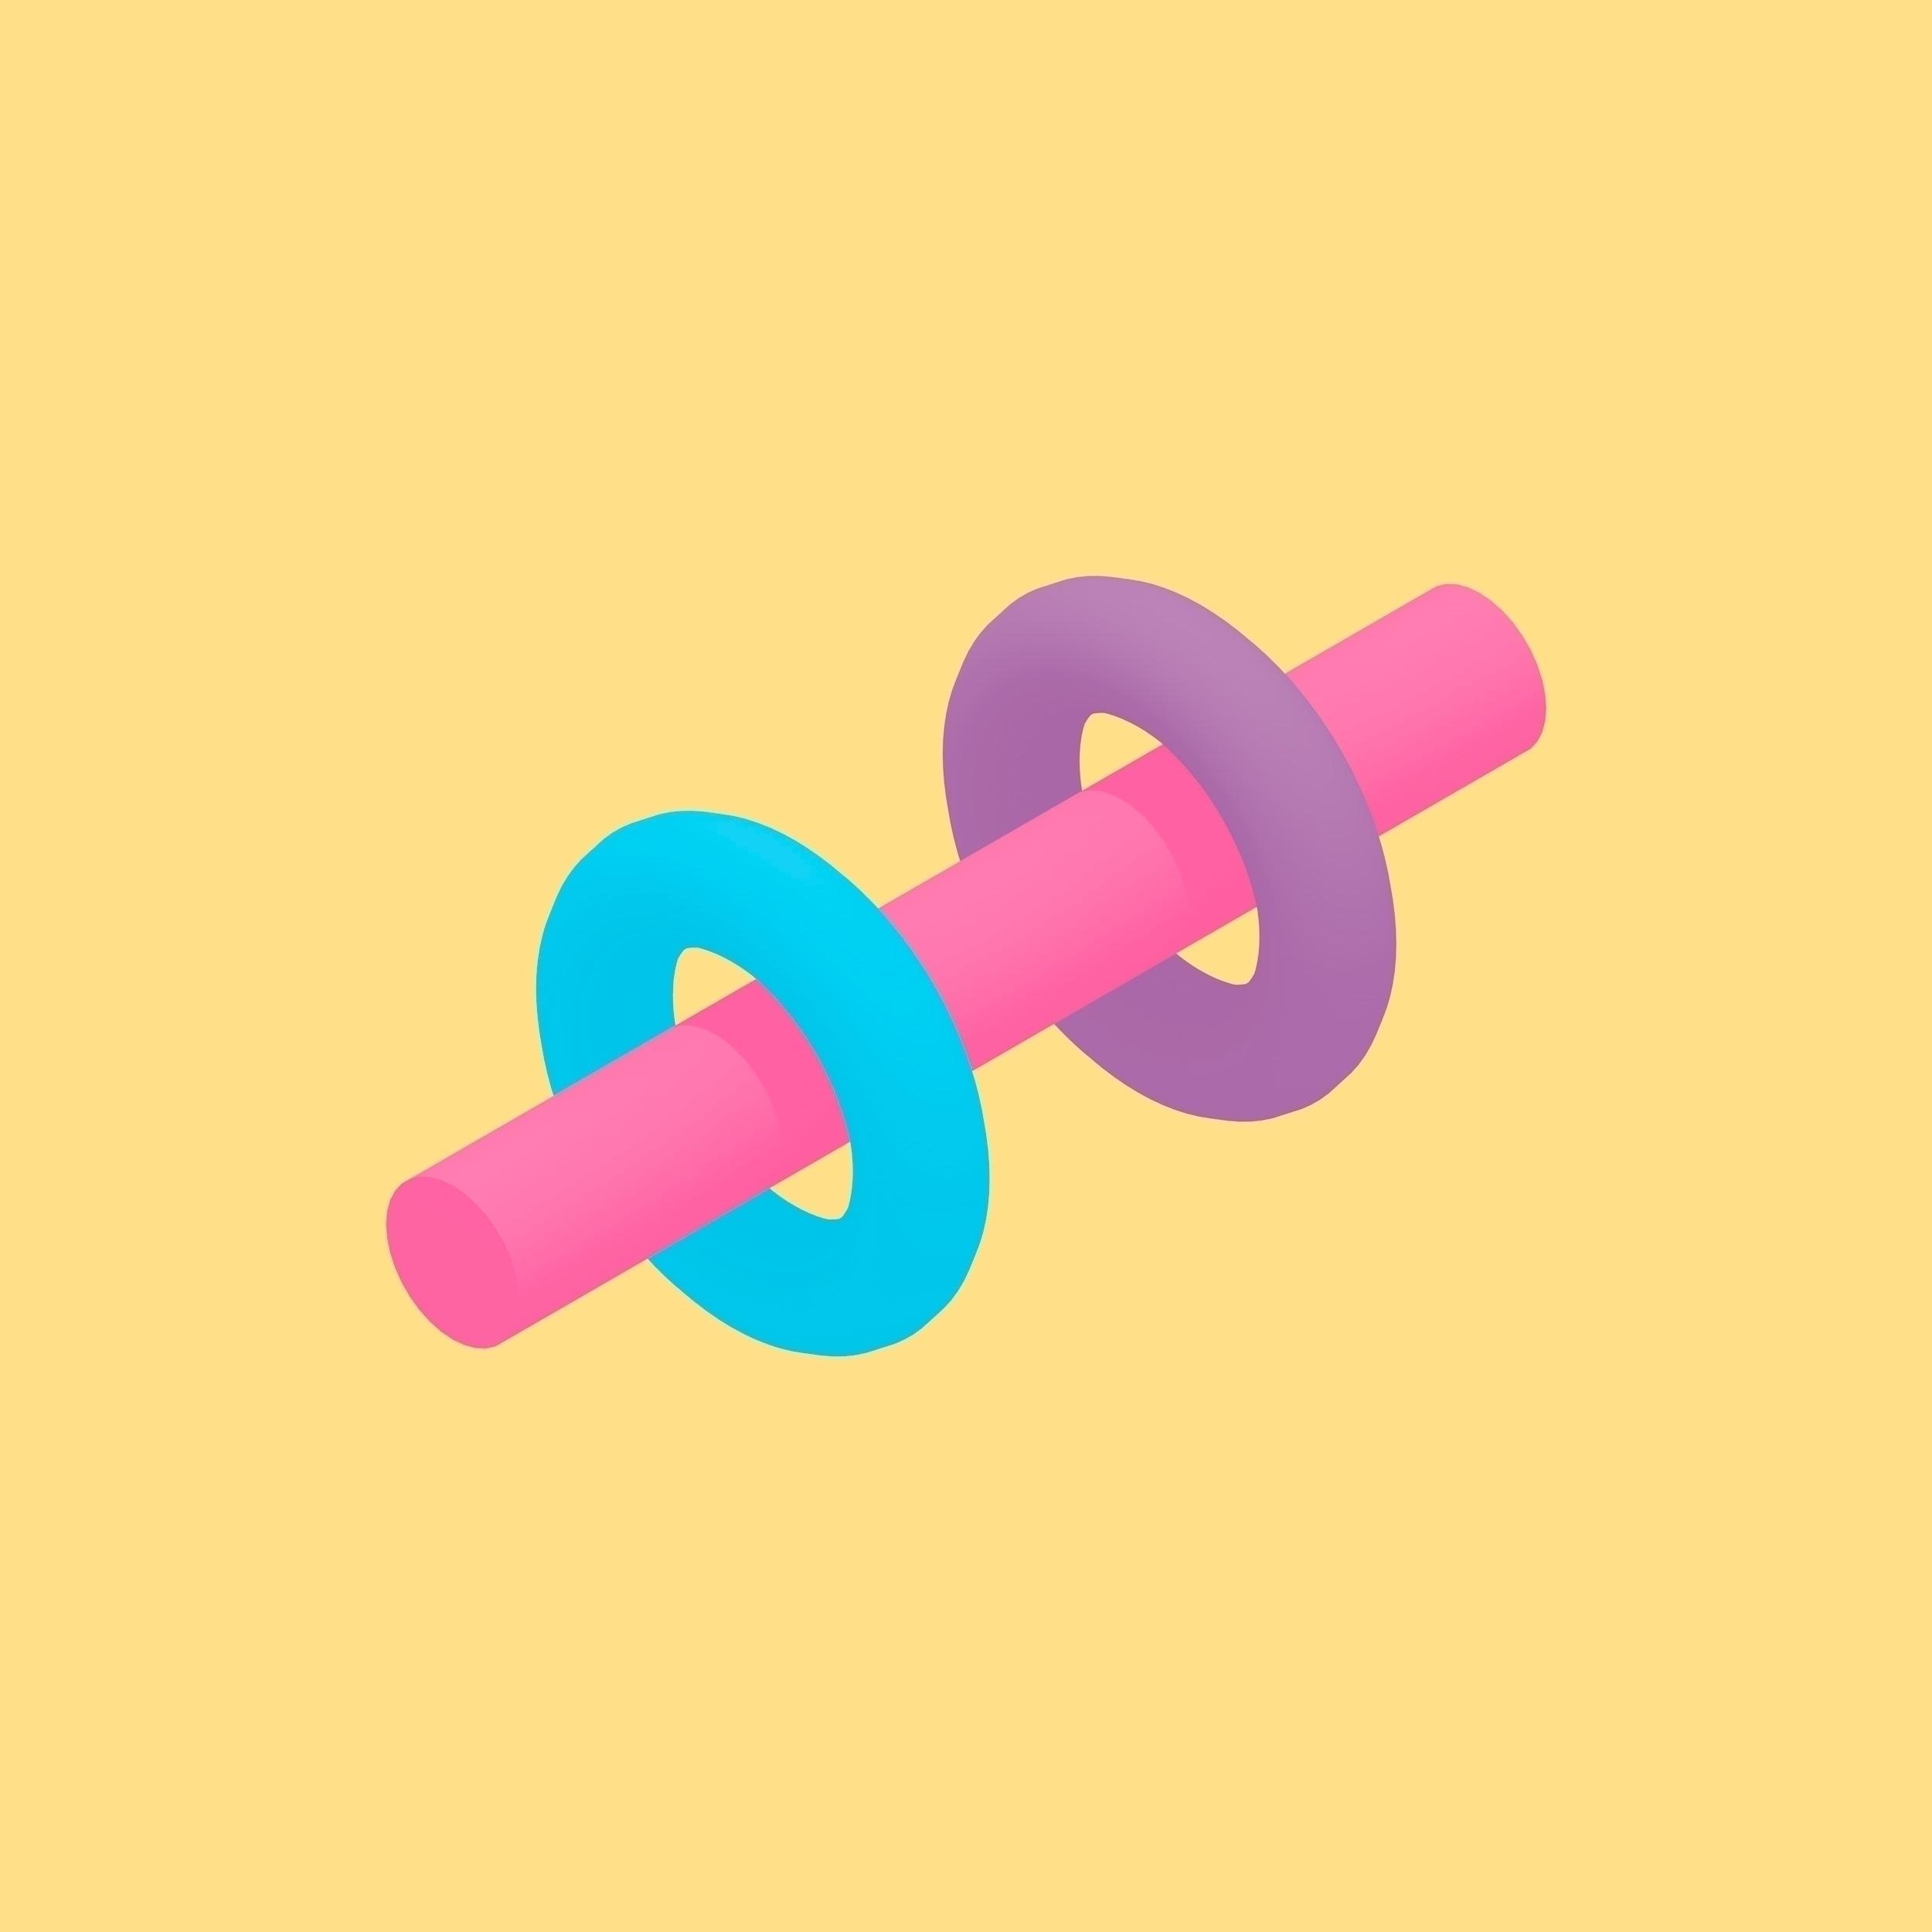 COLORS test minimalistic 3D - Minimalism - itstinyghost | ello